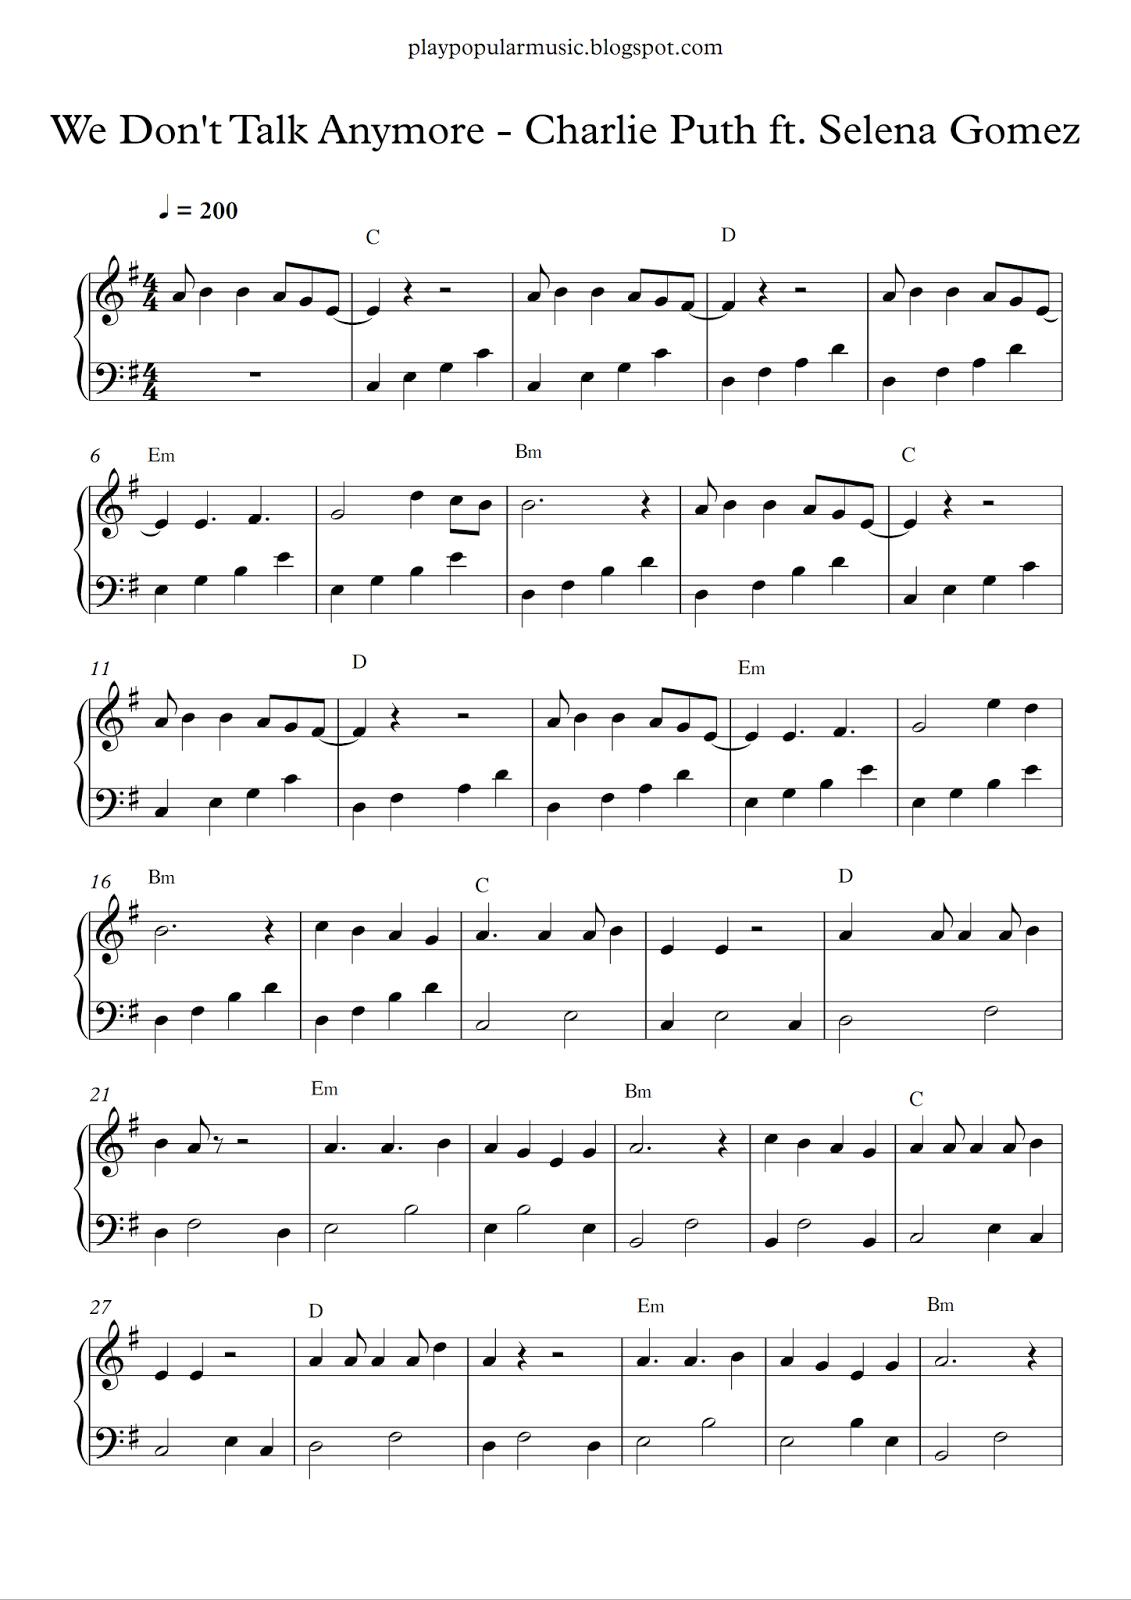 Free piano sheet music Charlie Puth ft. Selena Gomez We